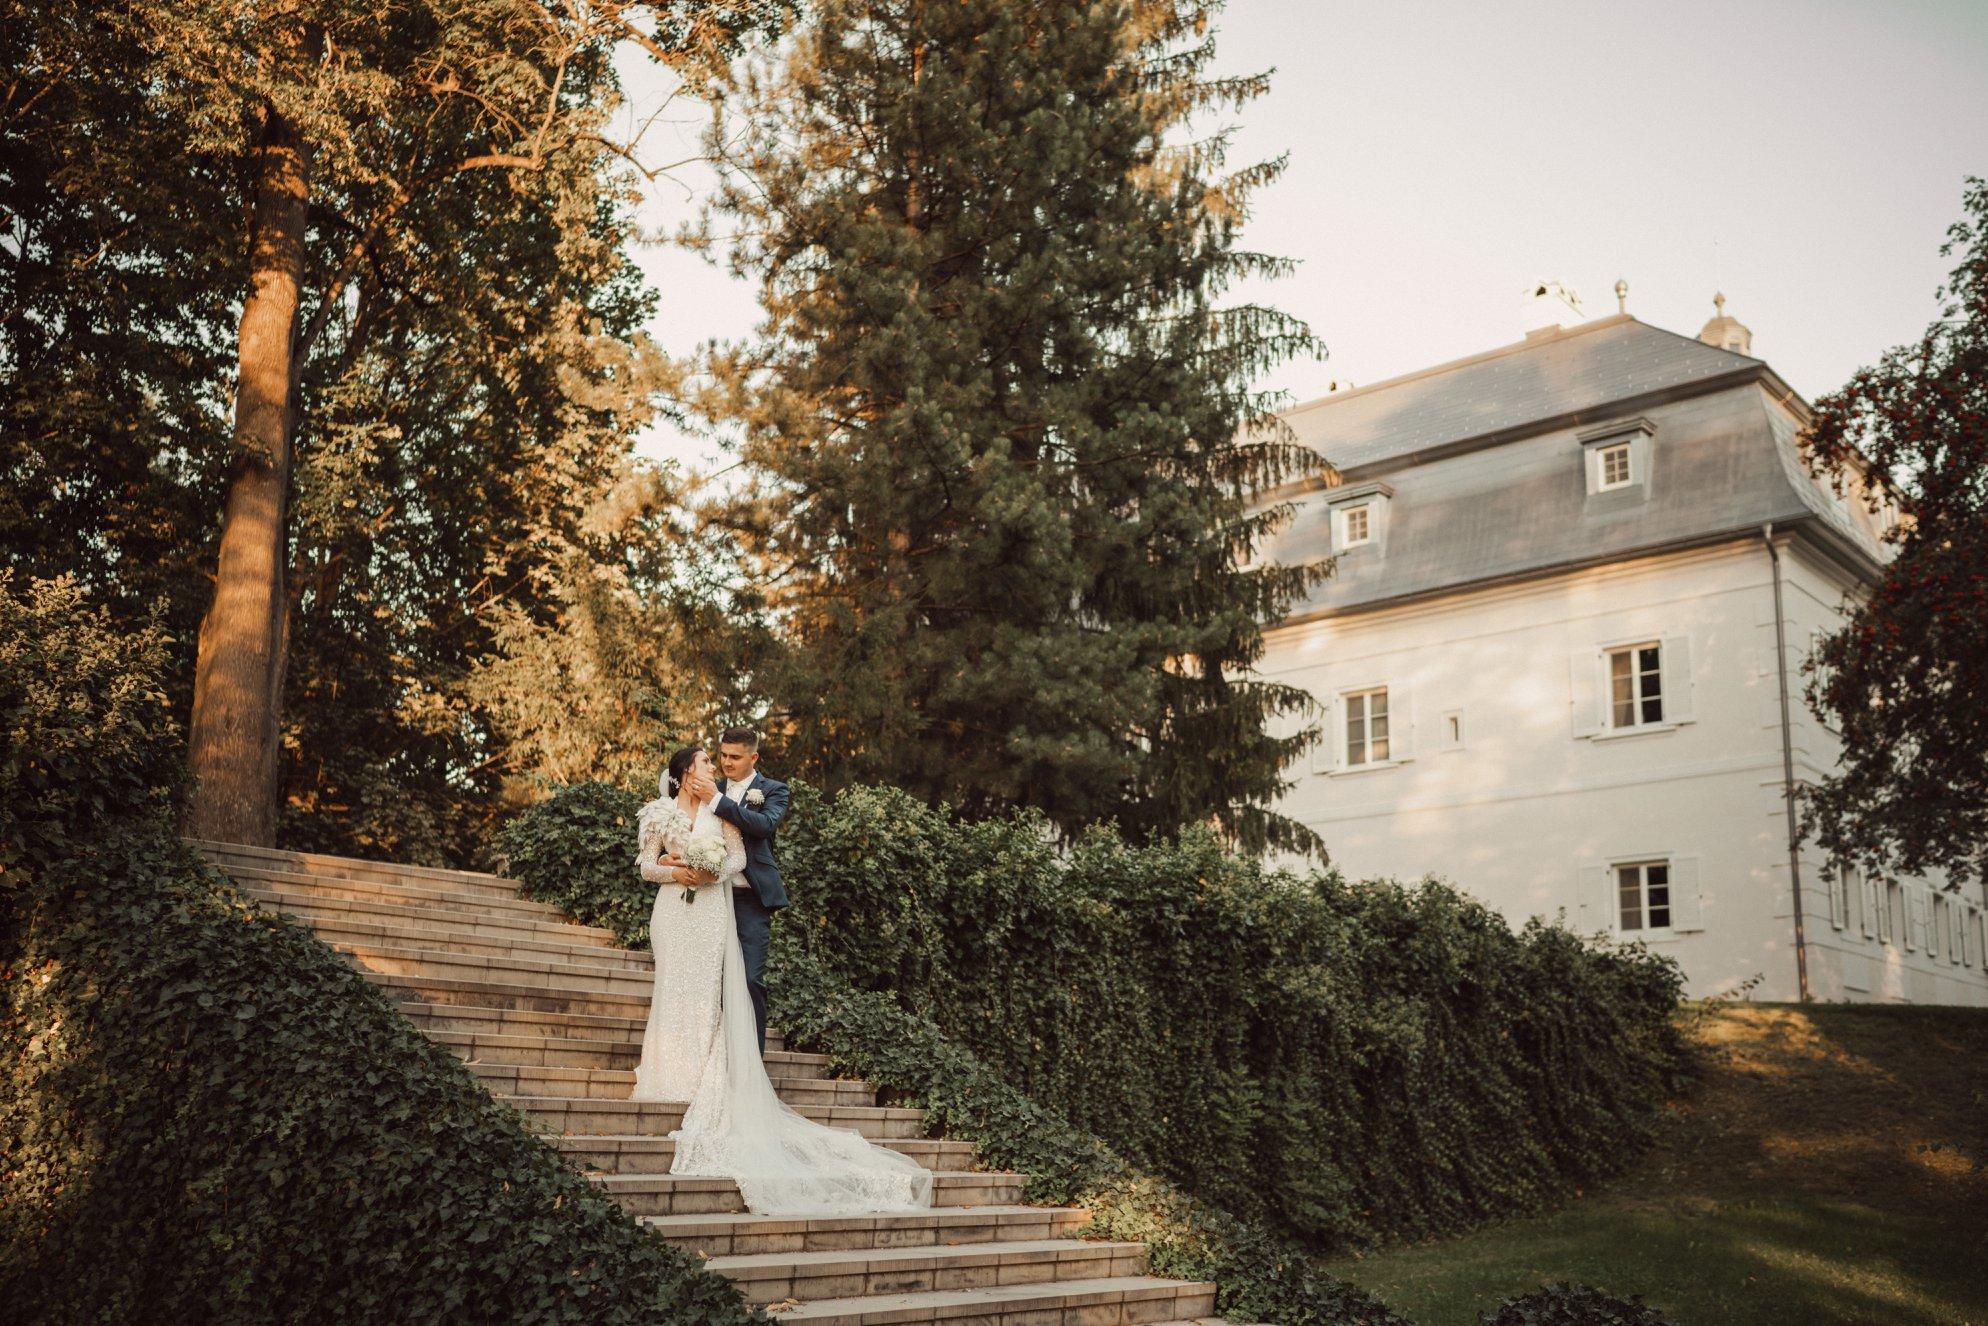 svadba-od-zazitkarovjpg